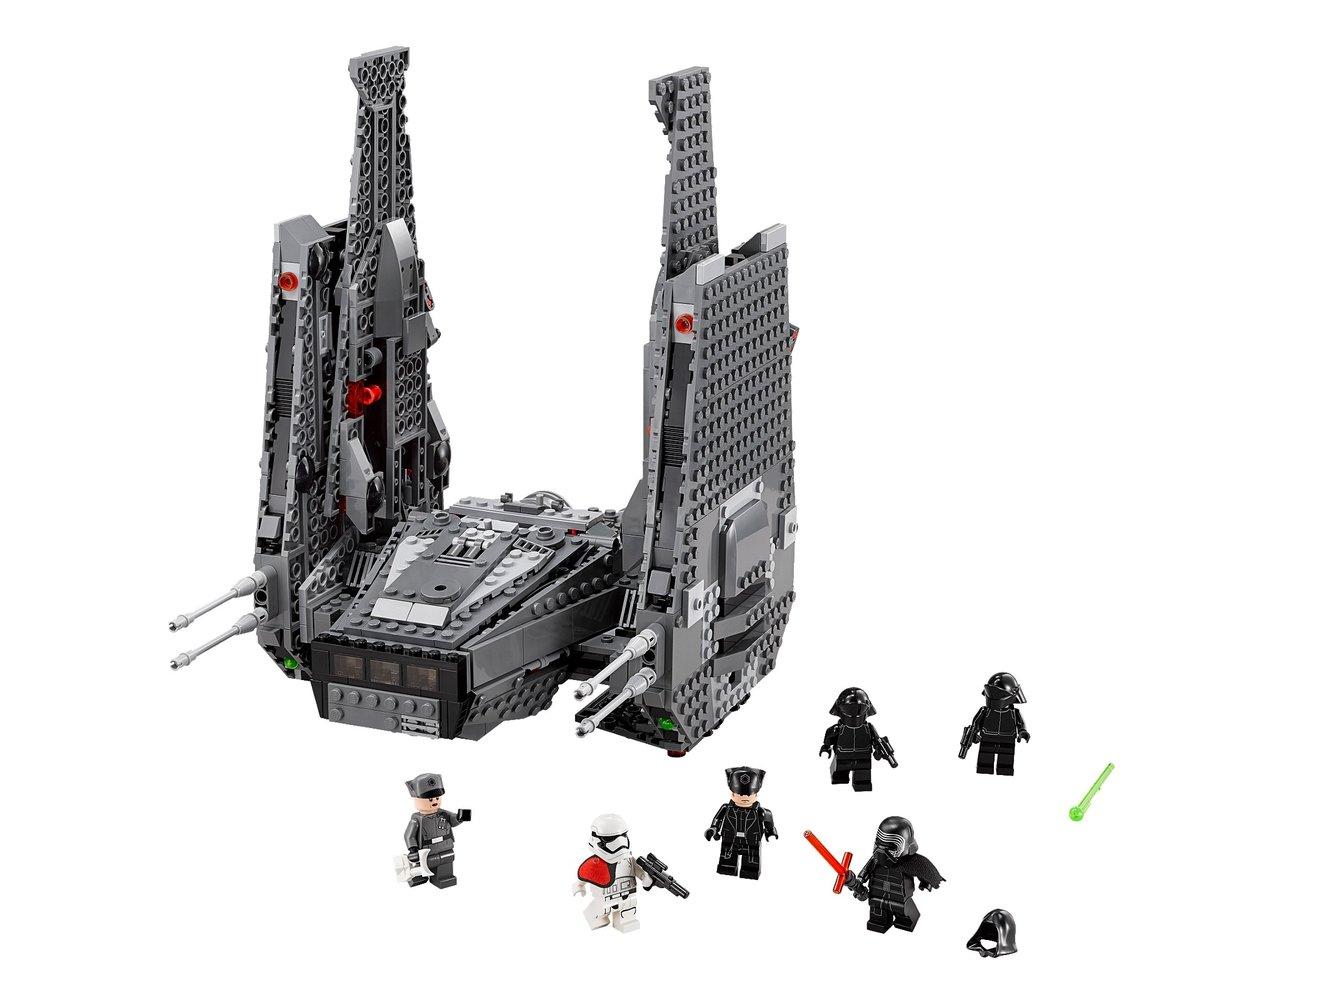 Kylo Ren's Command Shuttle